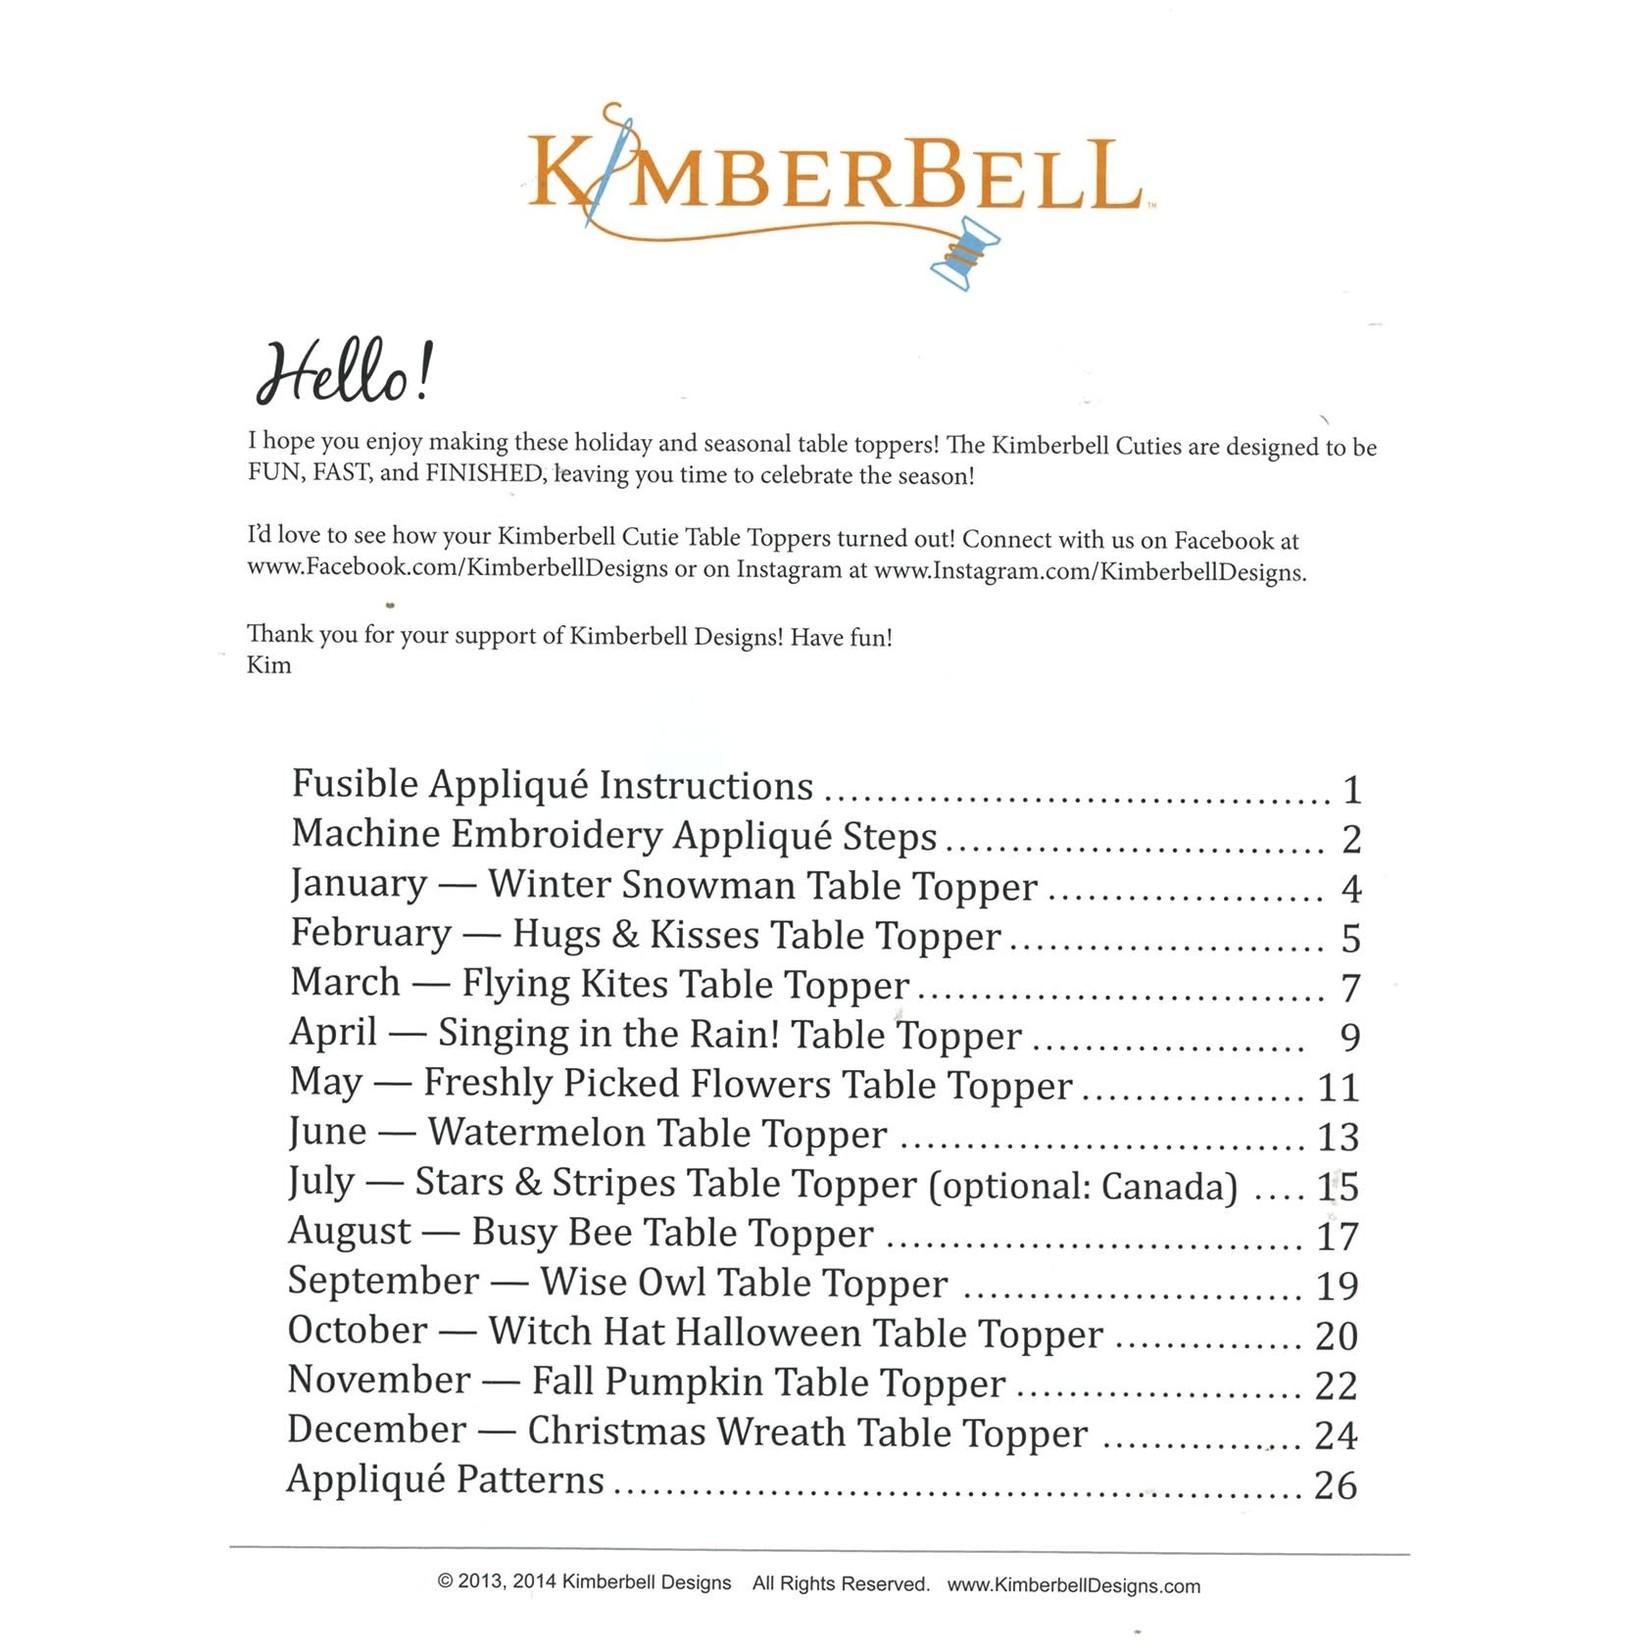 Kimberbell Designs Kimberbell Cuties: 12 Seasonal Table Toppers Pattern Book